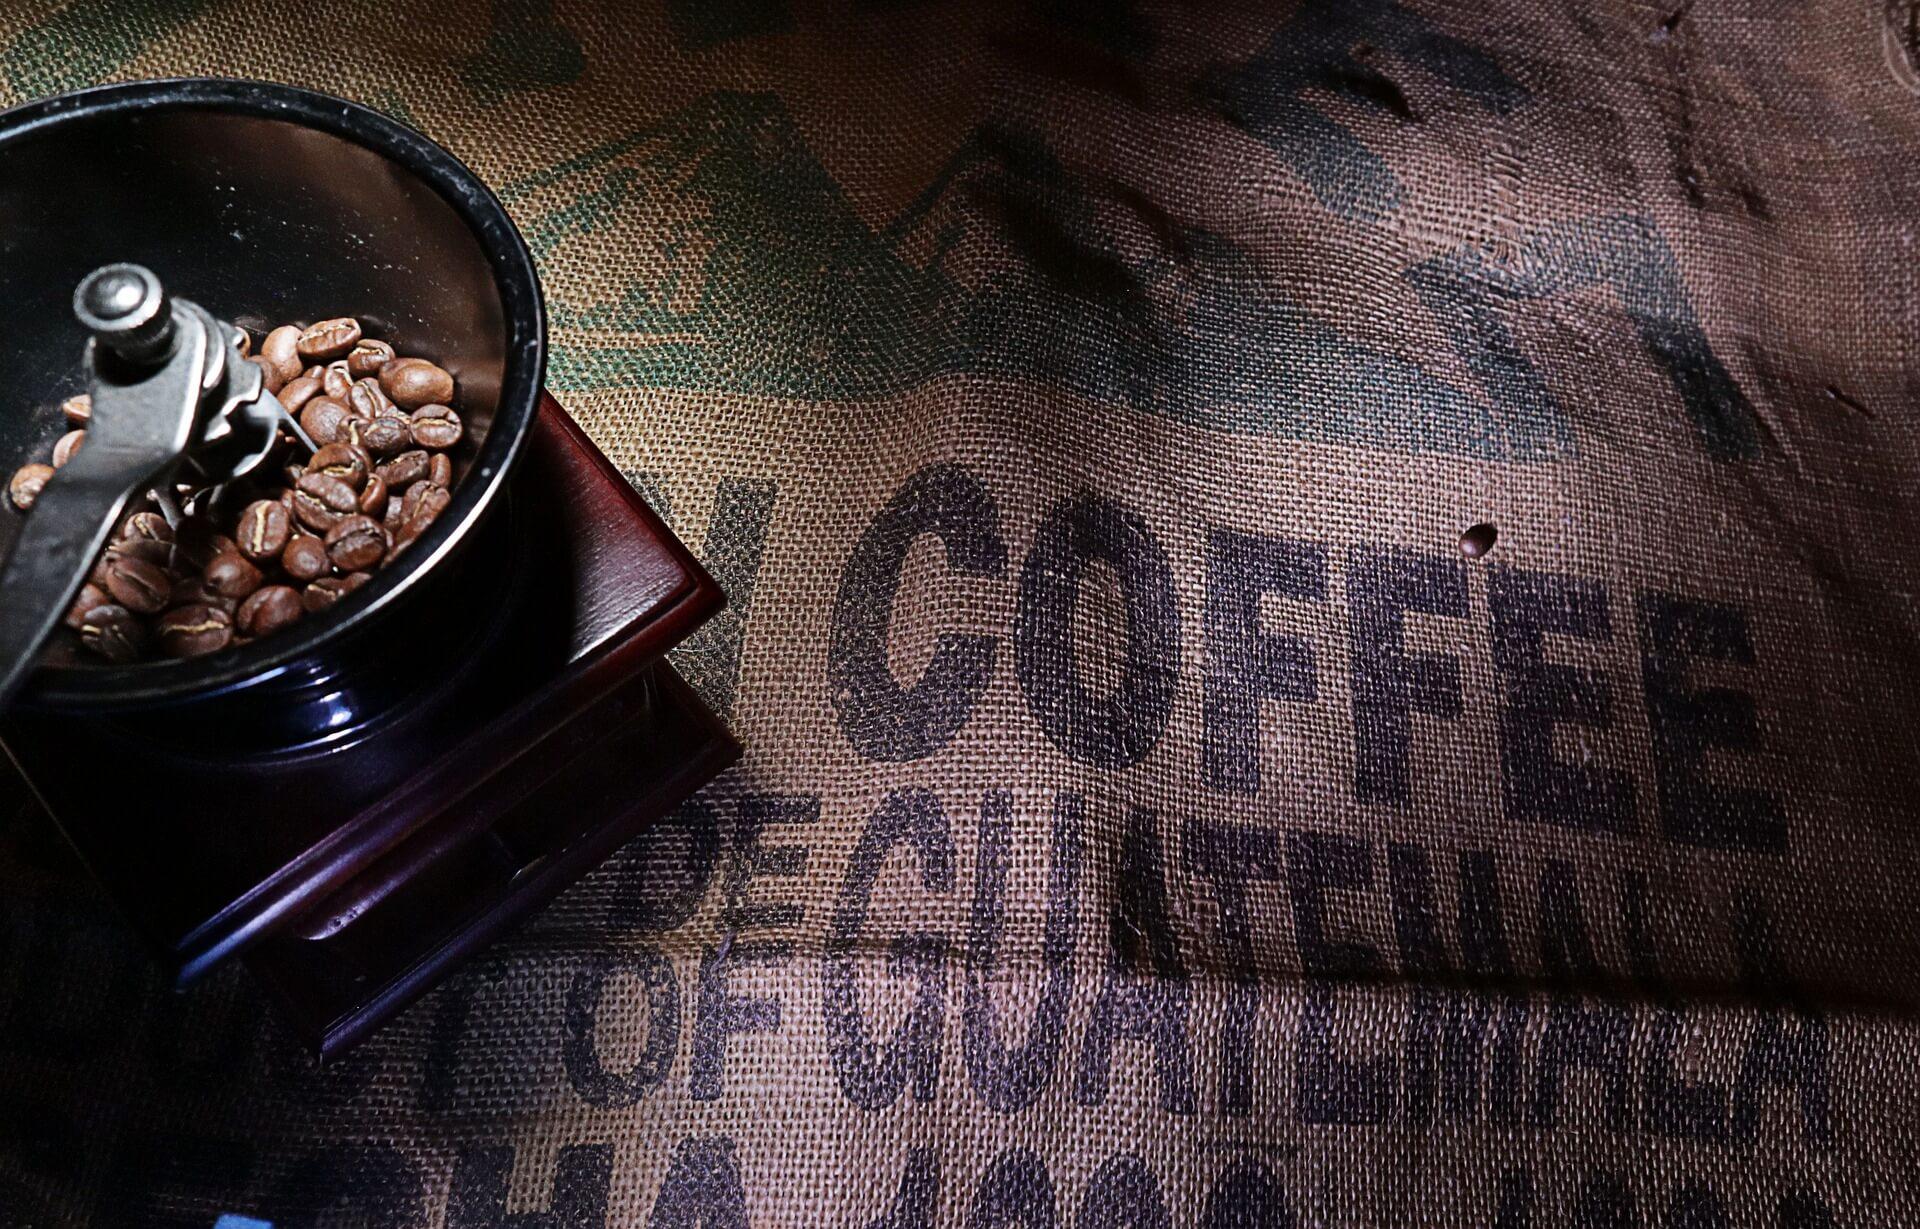 Prodej pravé zrnkové kávy.